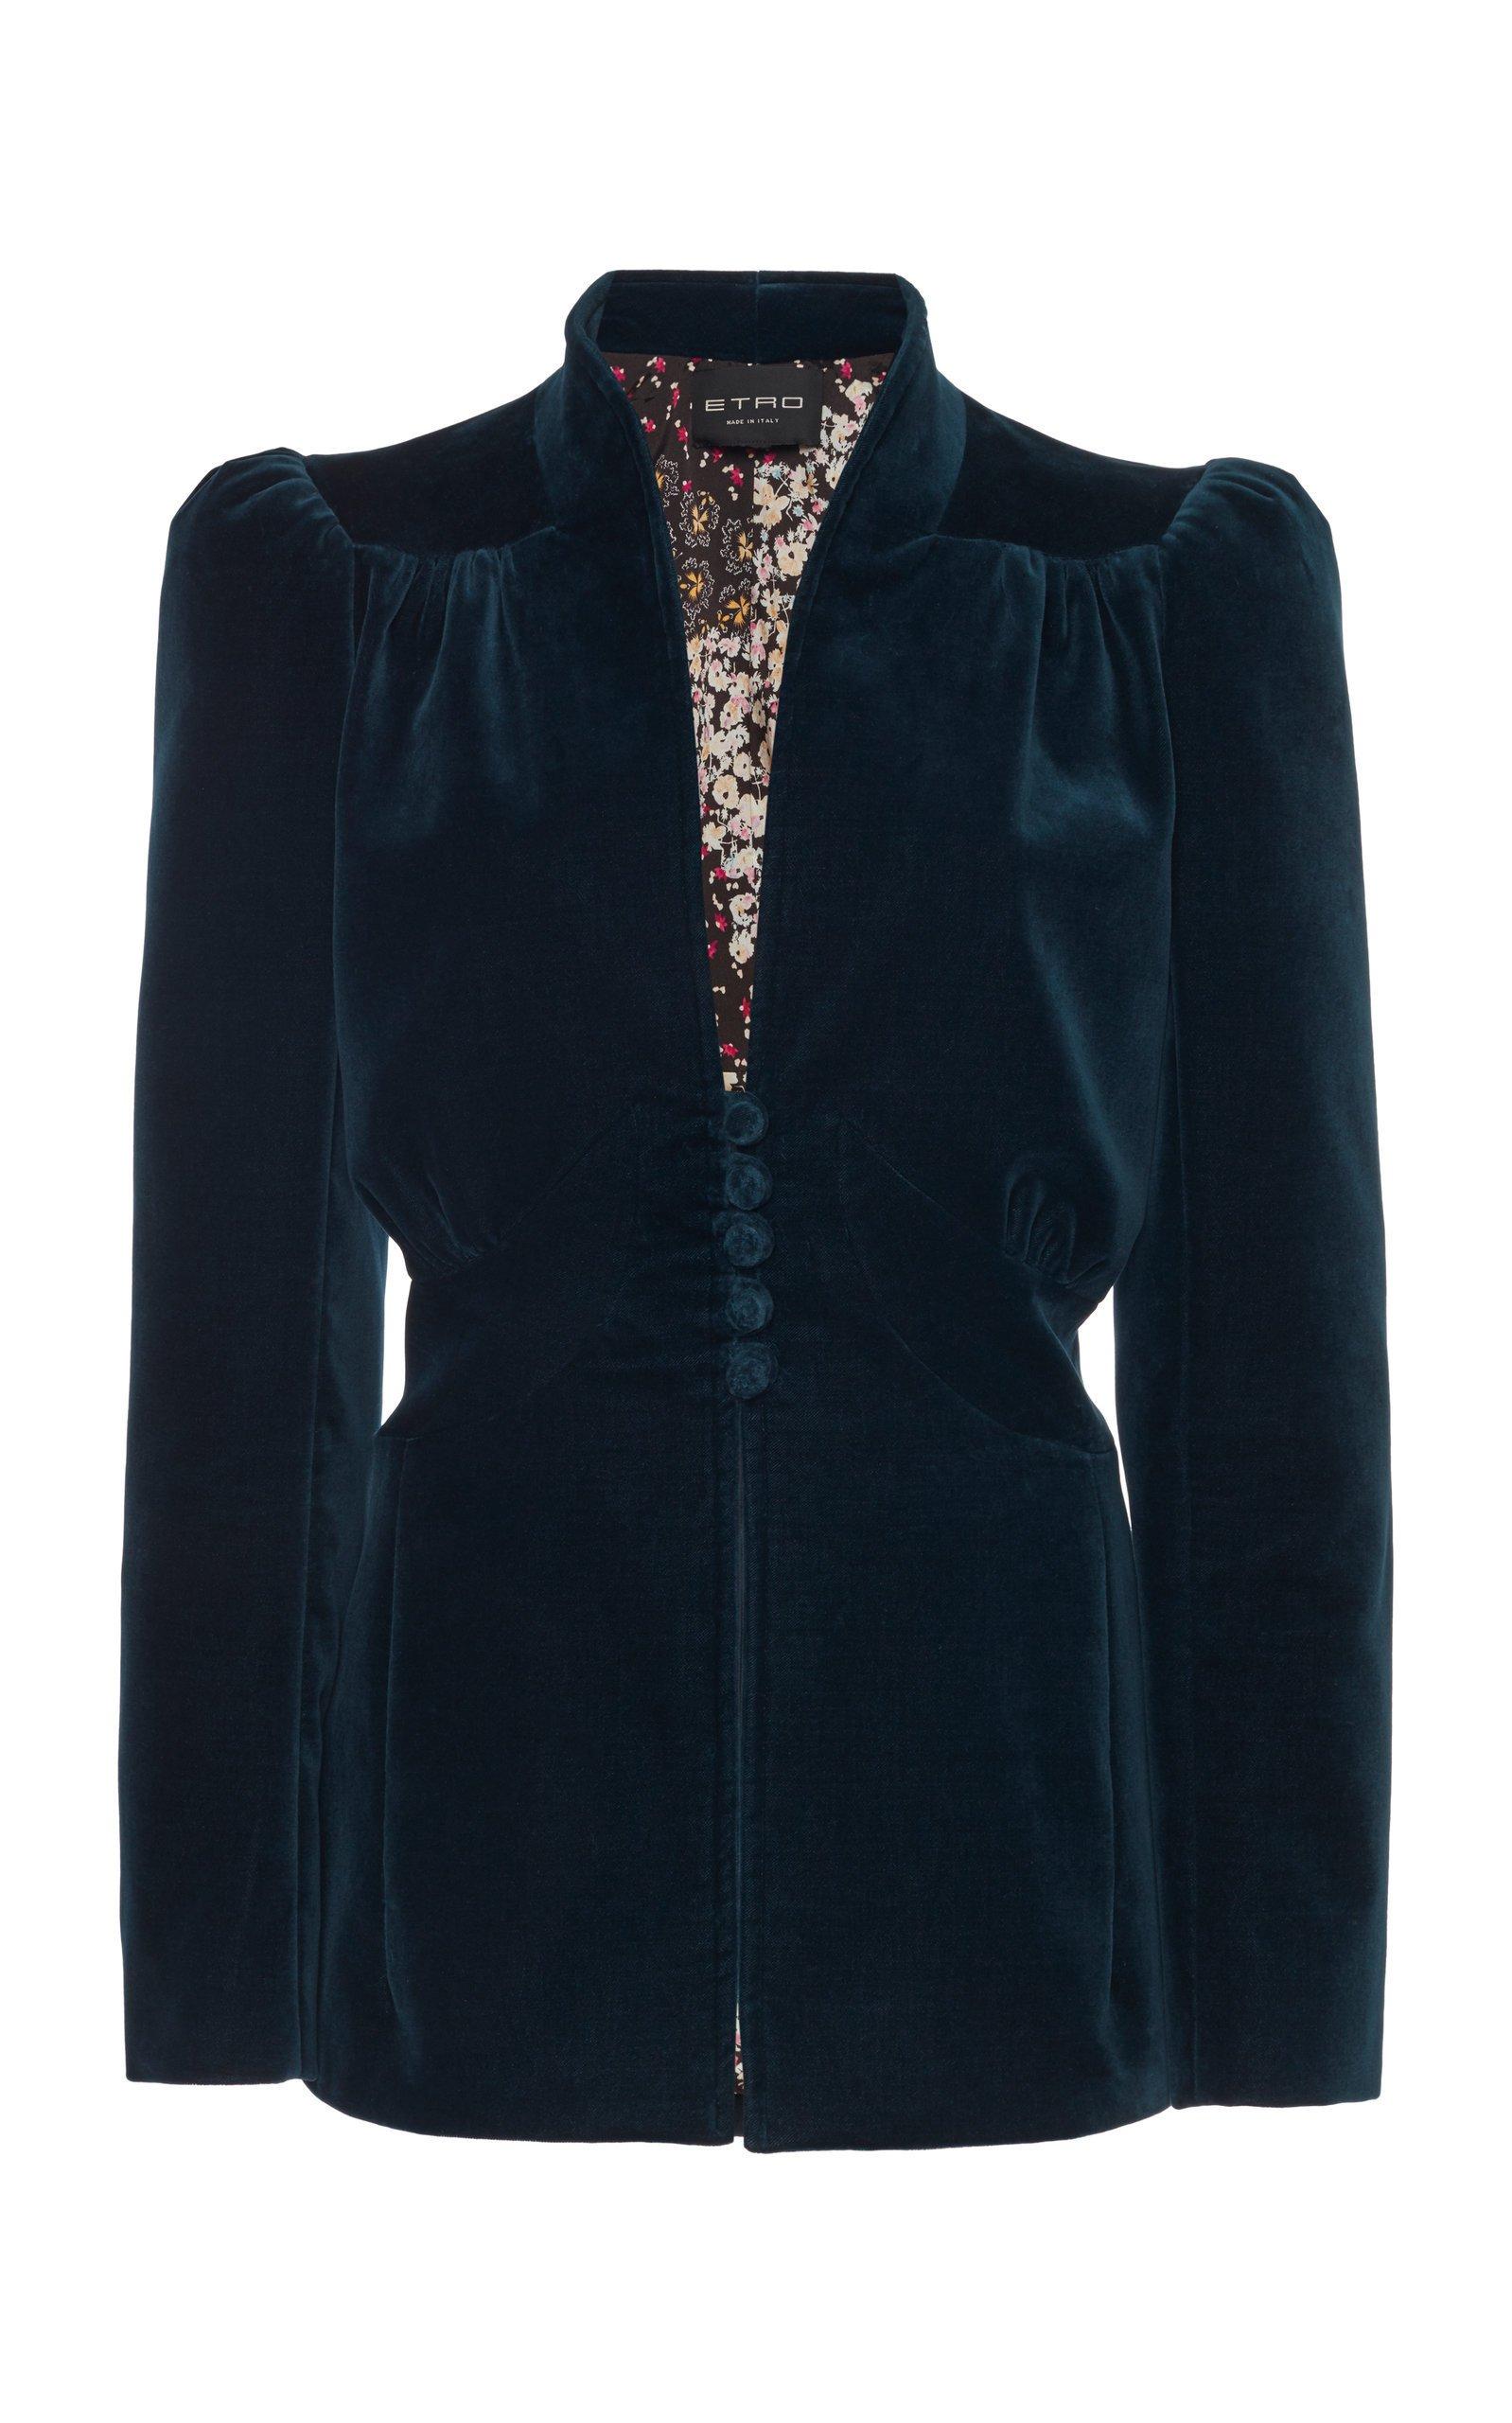 Etro Velvet Jacket Size: 38